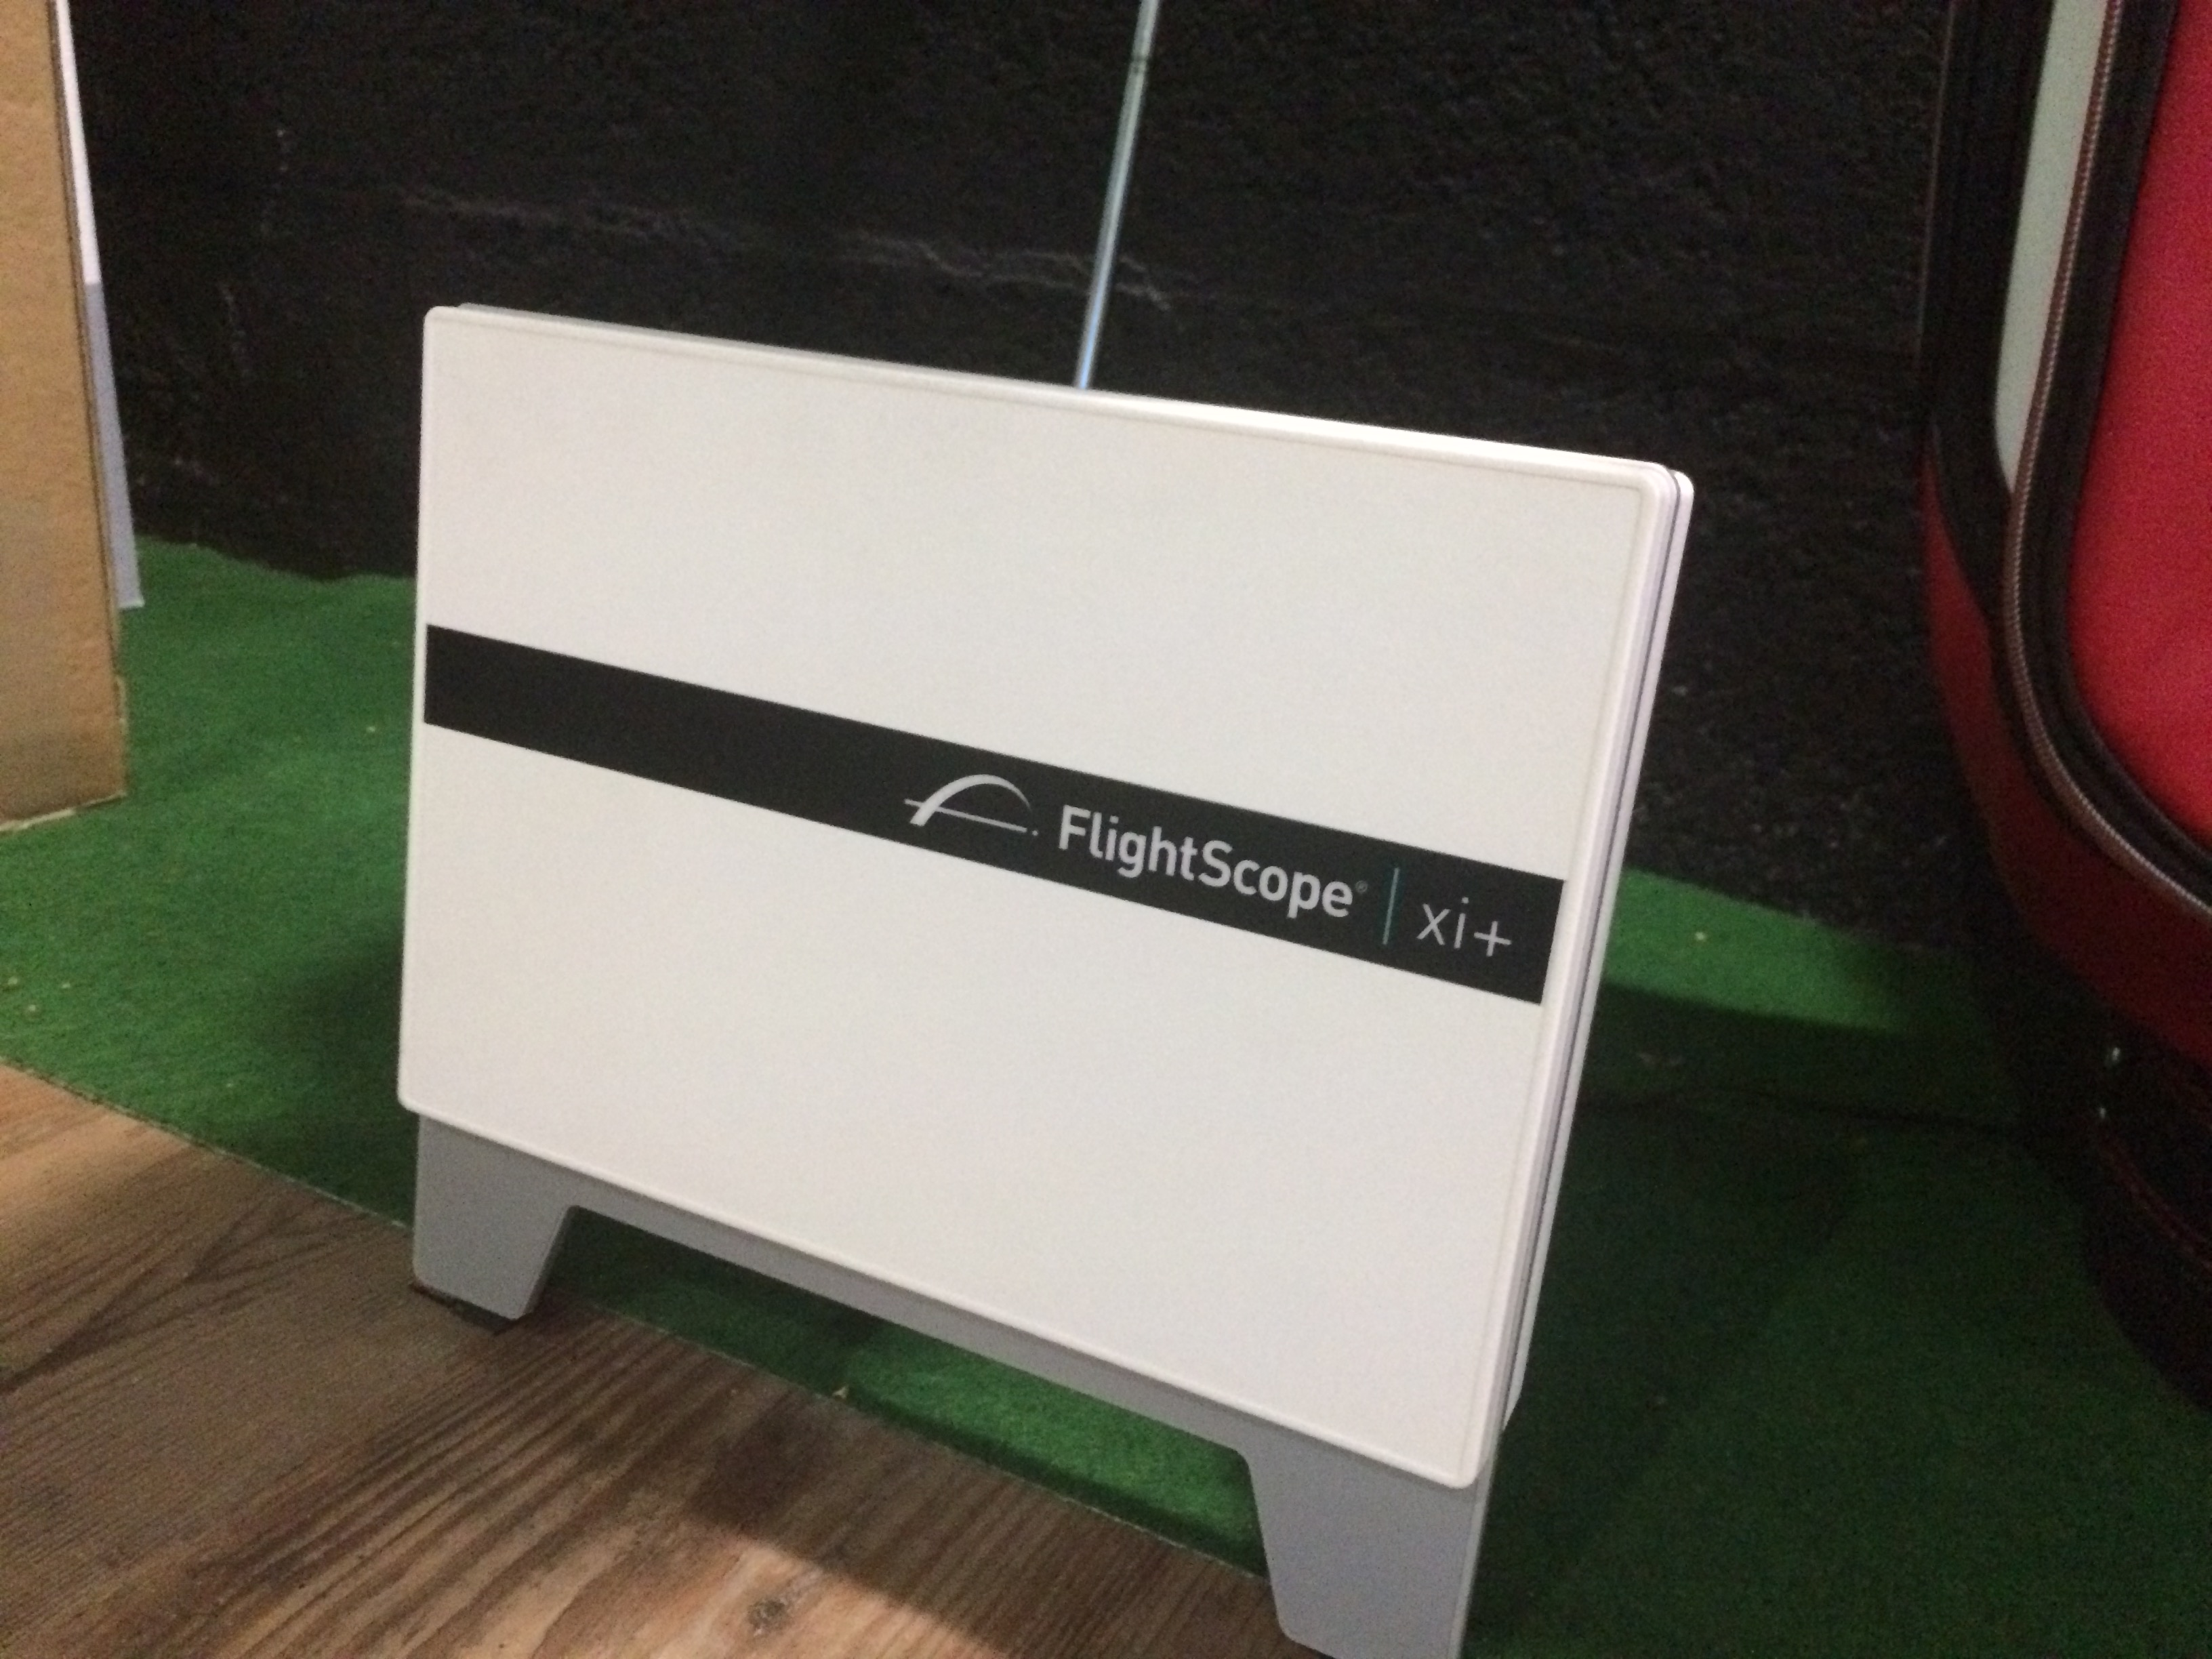 Flightscope XI+